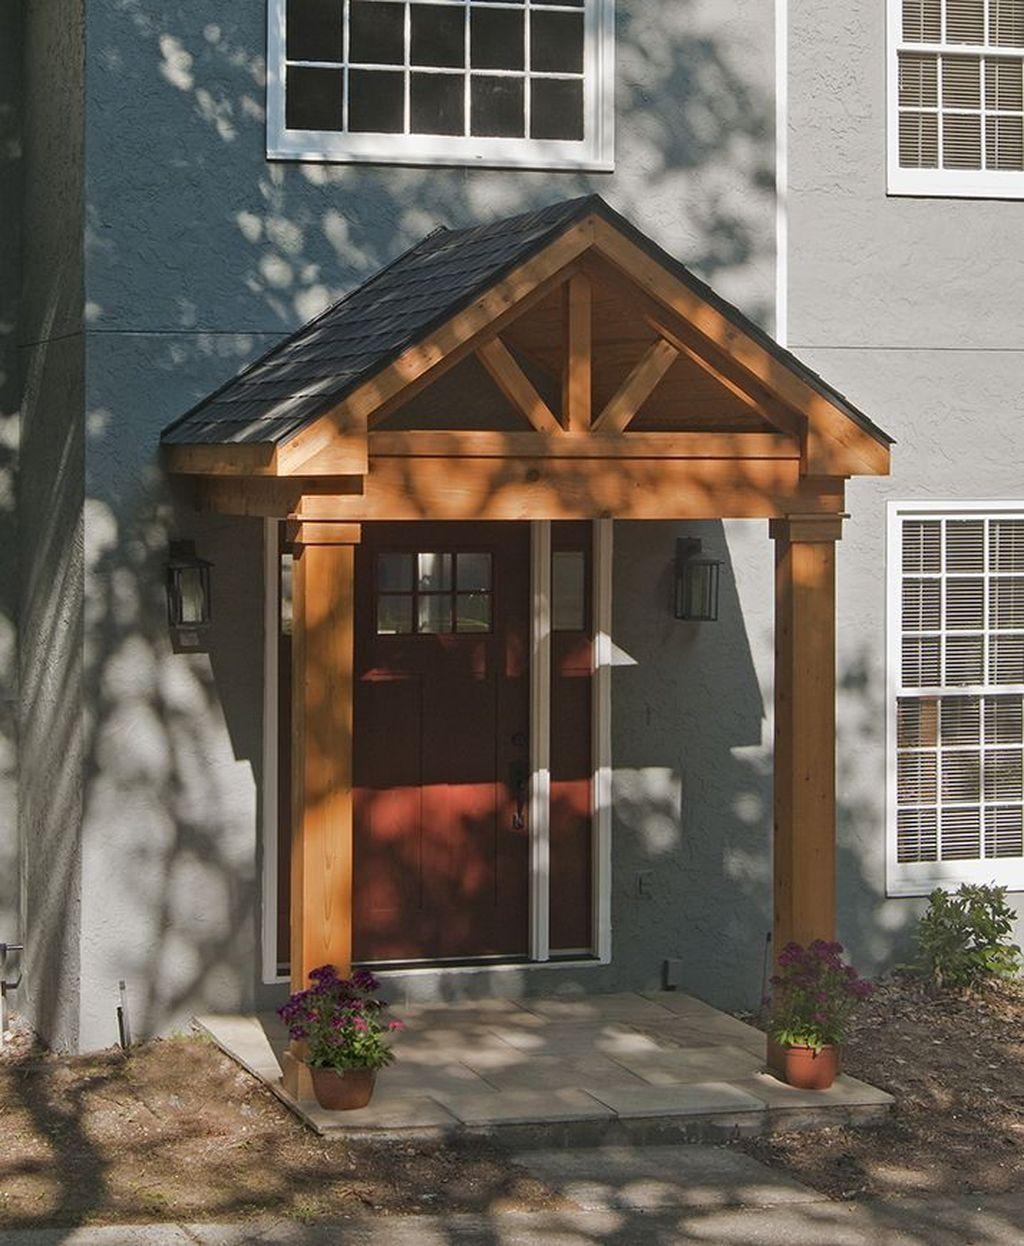 30 Comfy Porch Design Ideas For Backyard With Images Porch Design Front Porch Design House With Porch